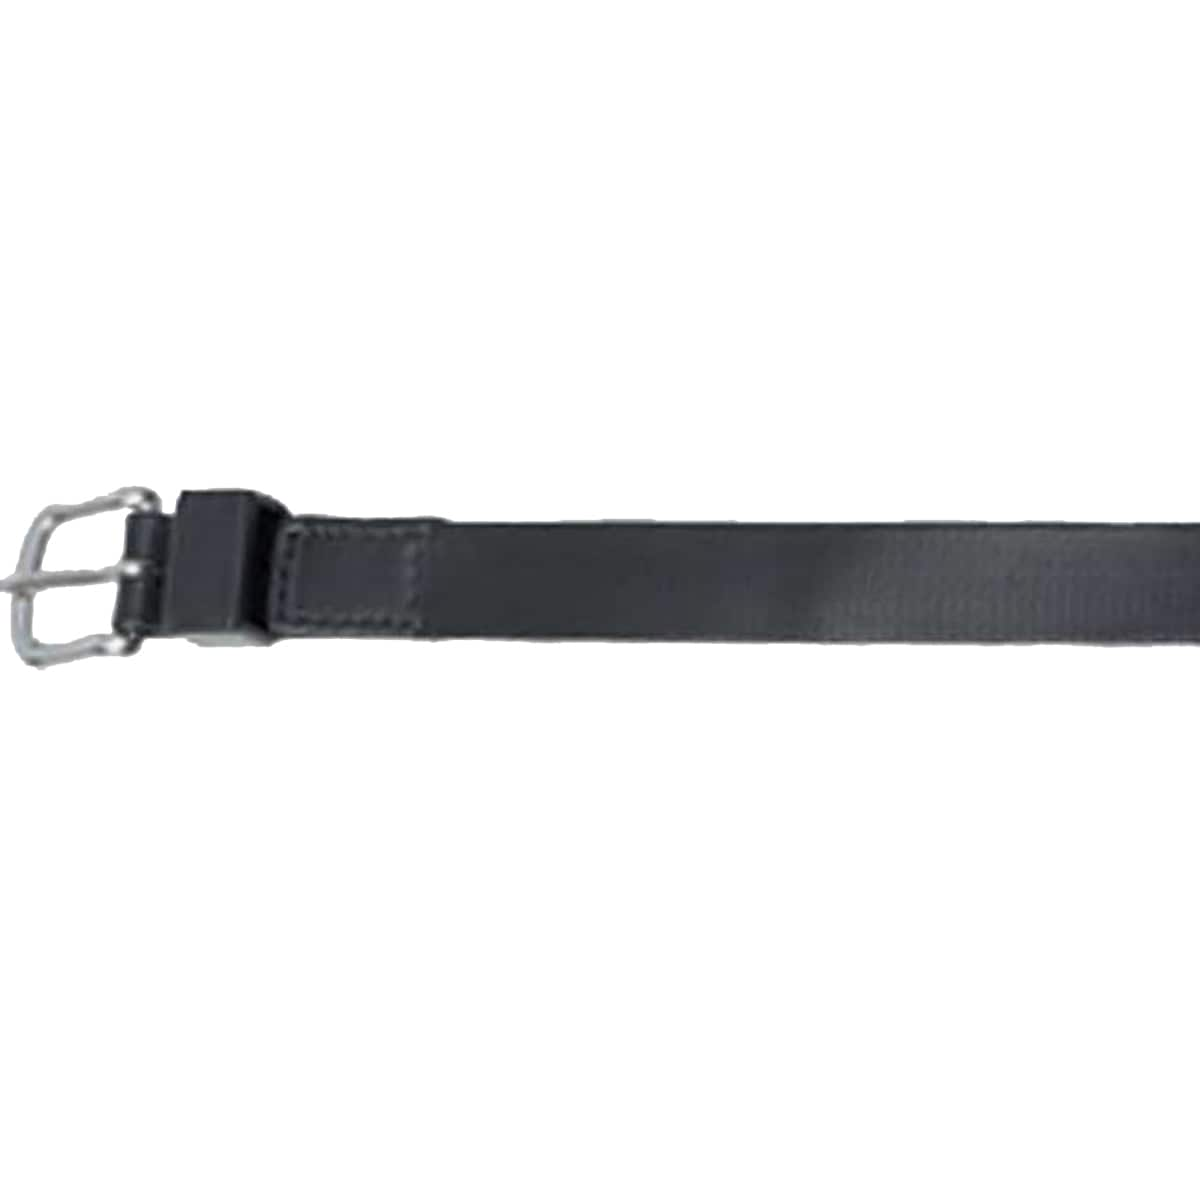 Zilco ekstra magebånd (QH) Standard